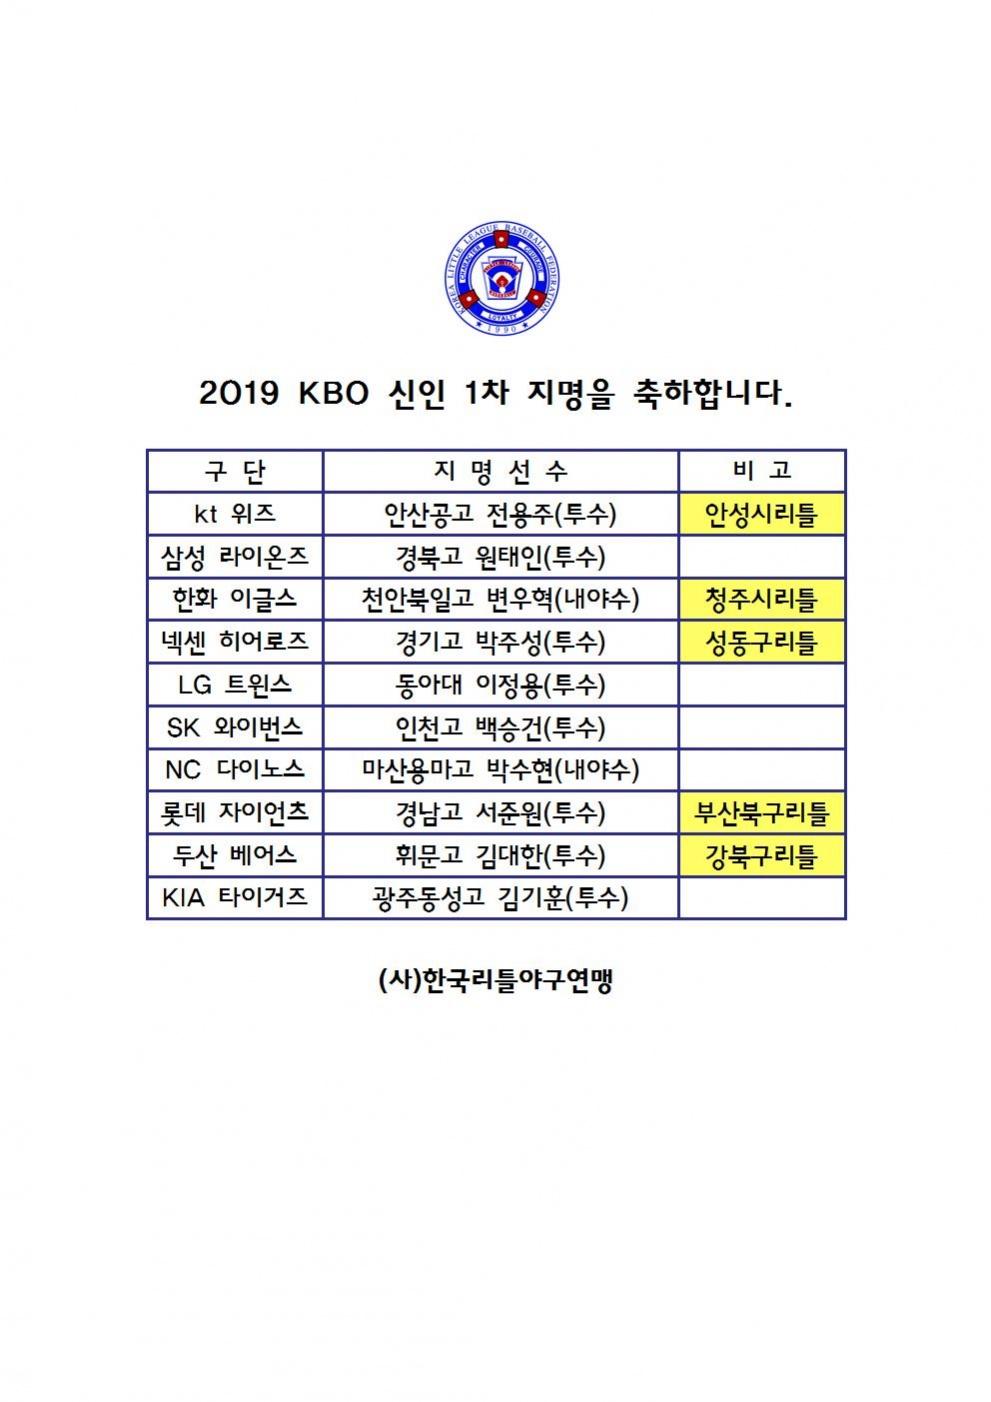 2019 KBO 신인 드래프트 1차 지명001.jpg